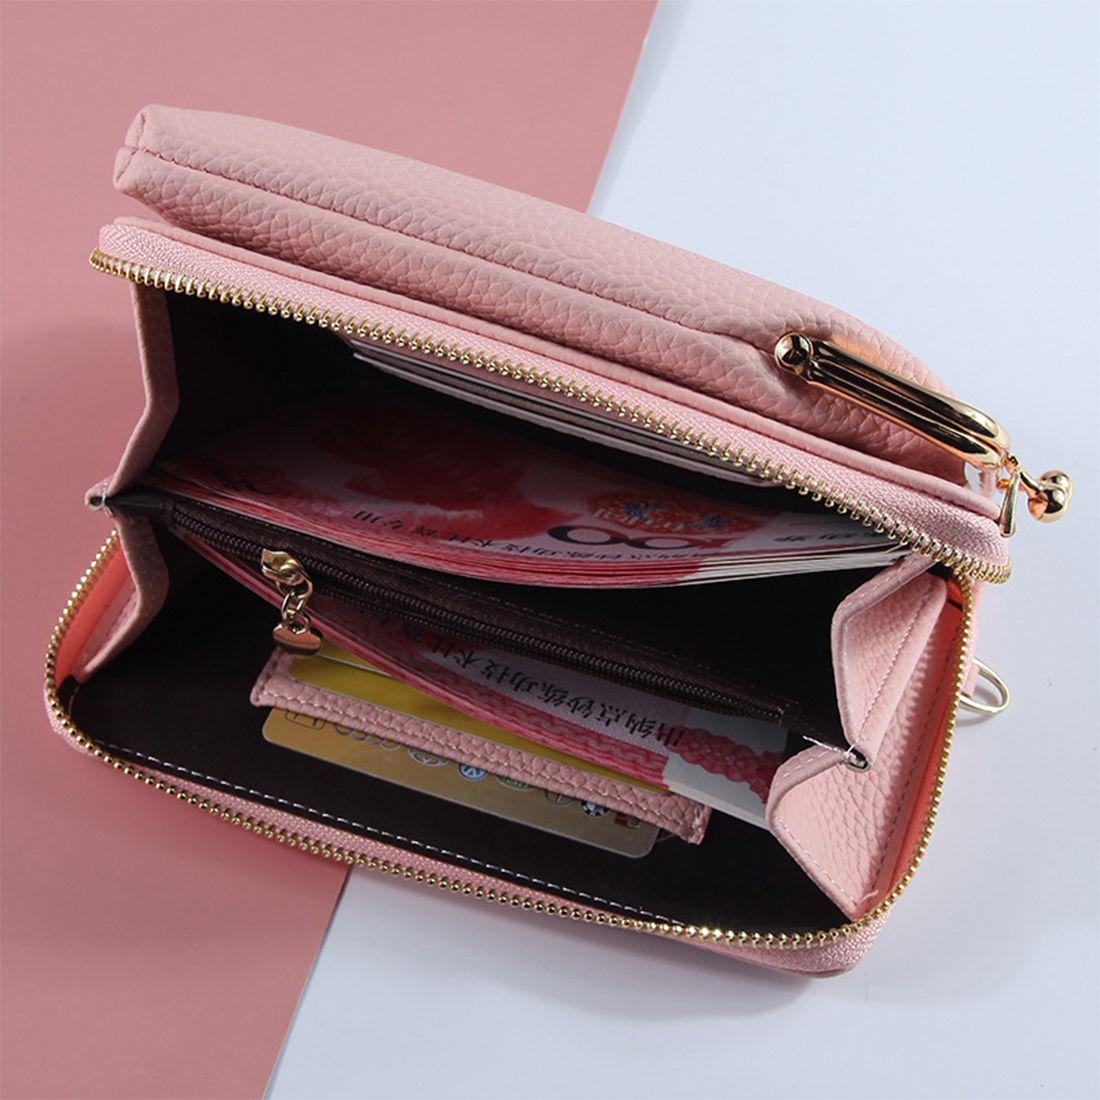 Fashion PU Small Crossbody Bags Leather 007 Women Ladies Purse Bag For Mini Cute Wallet Shoulder Phone Flap Zipper Messenger Girls Gjpeu